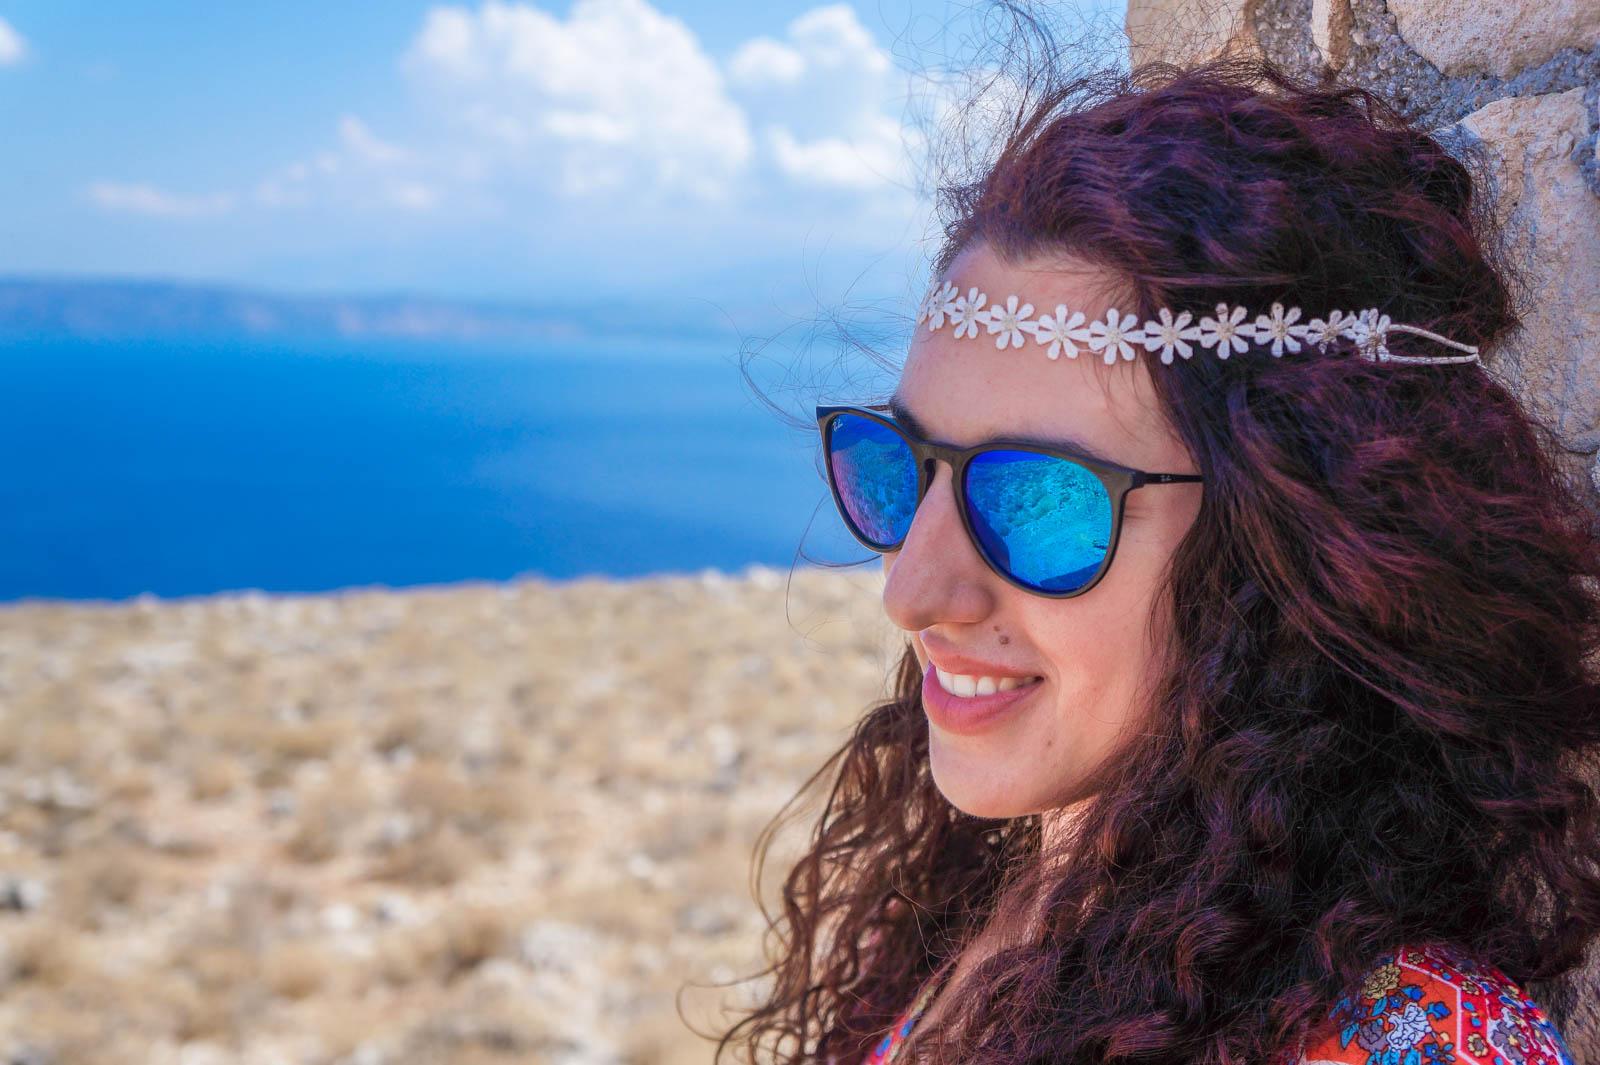 mpalos-beach-crete-greece-la-vie-en-blog-all-rights-reserved-3